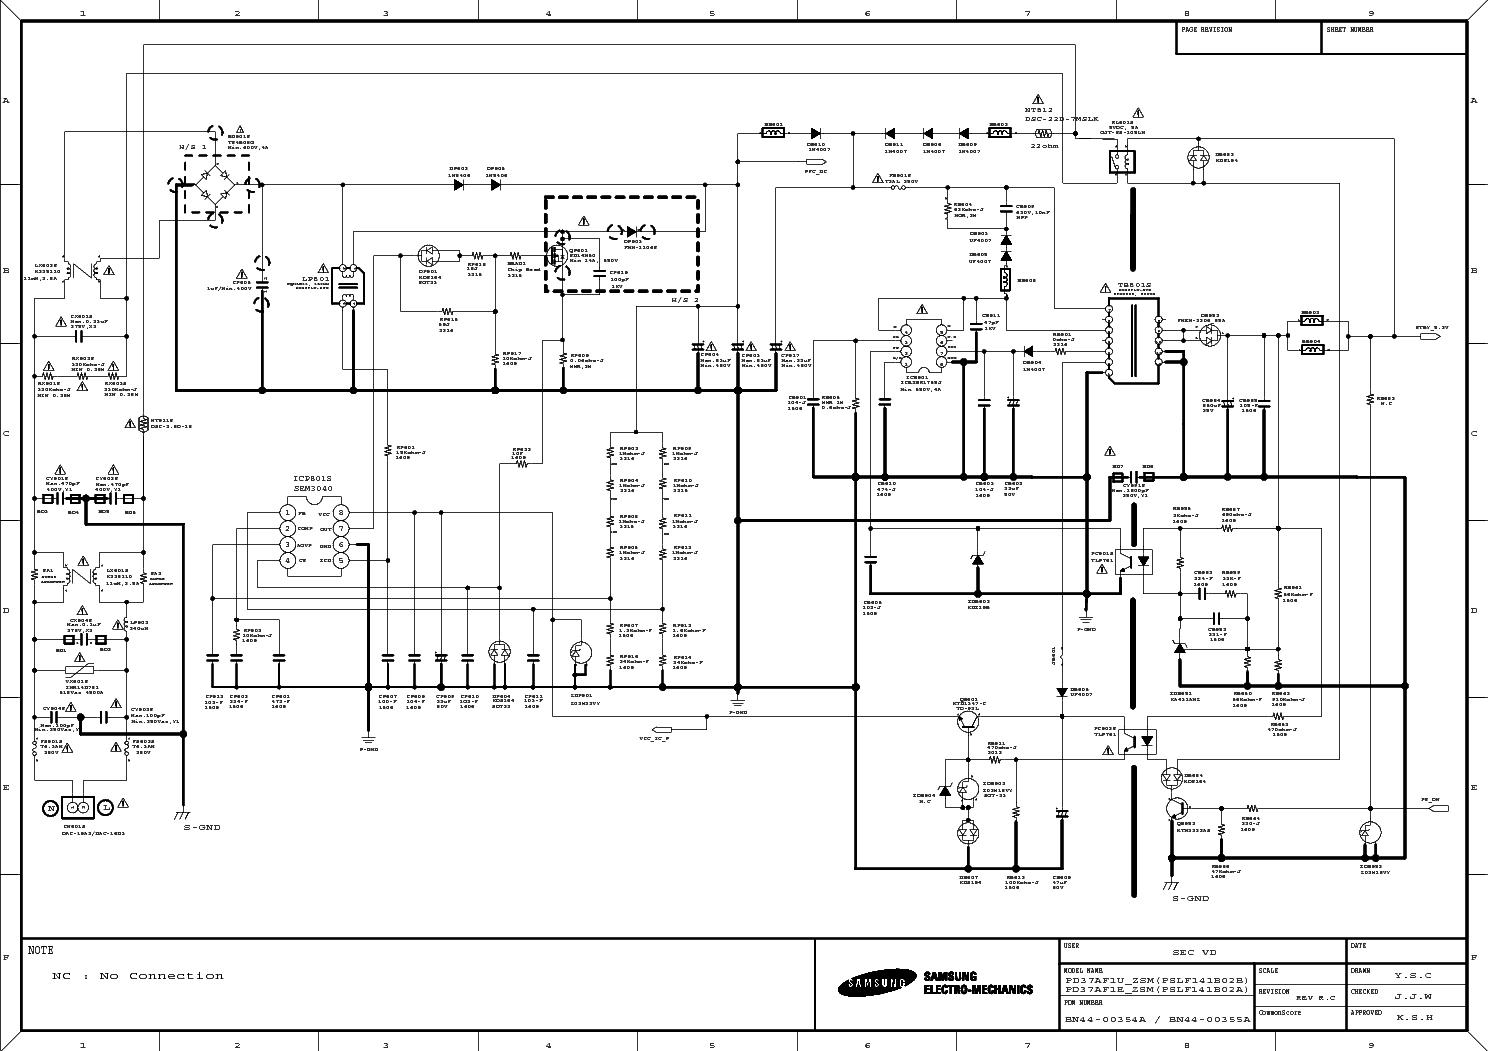 samsung sw80usp service manual